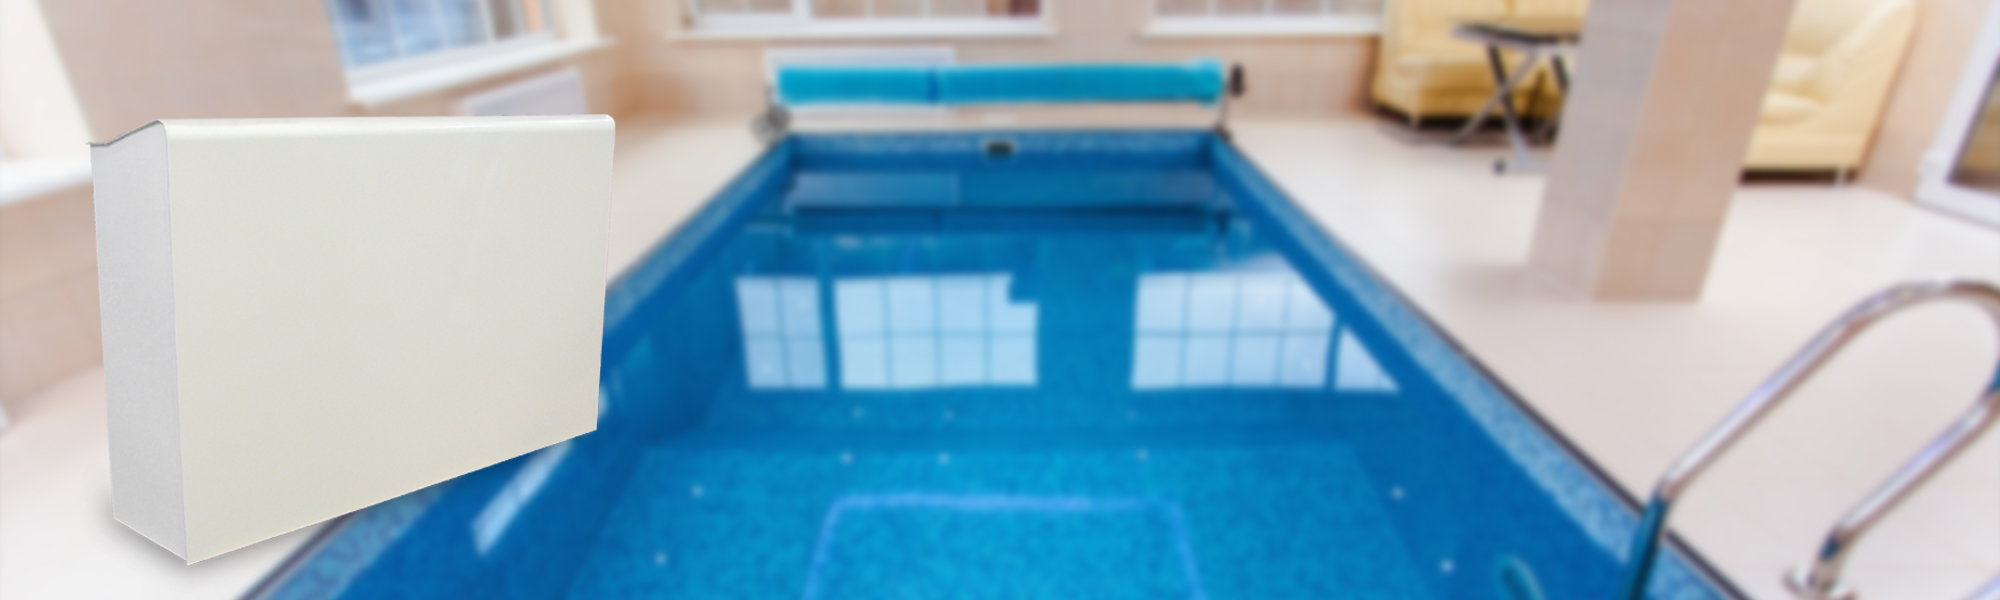 Serie KPS deumidificatori d'arredo per piscine